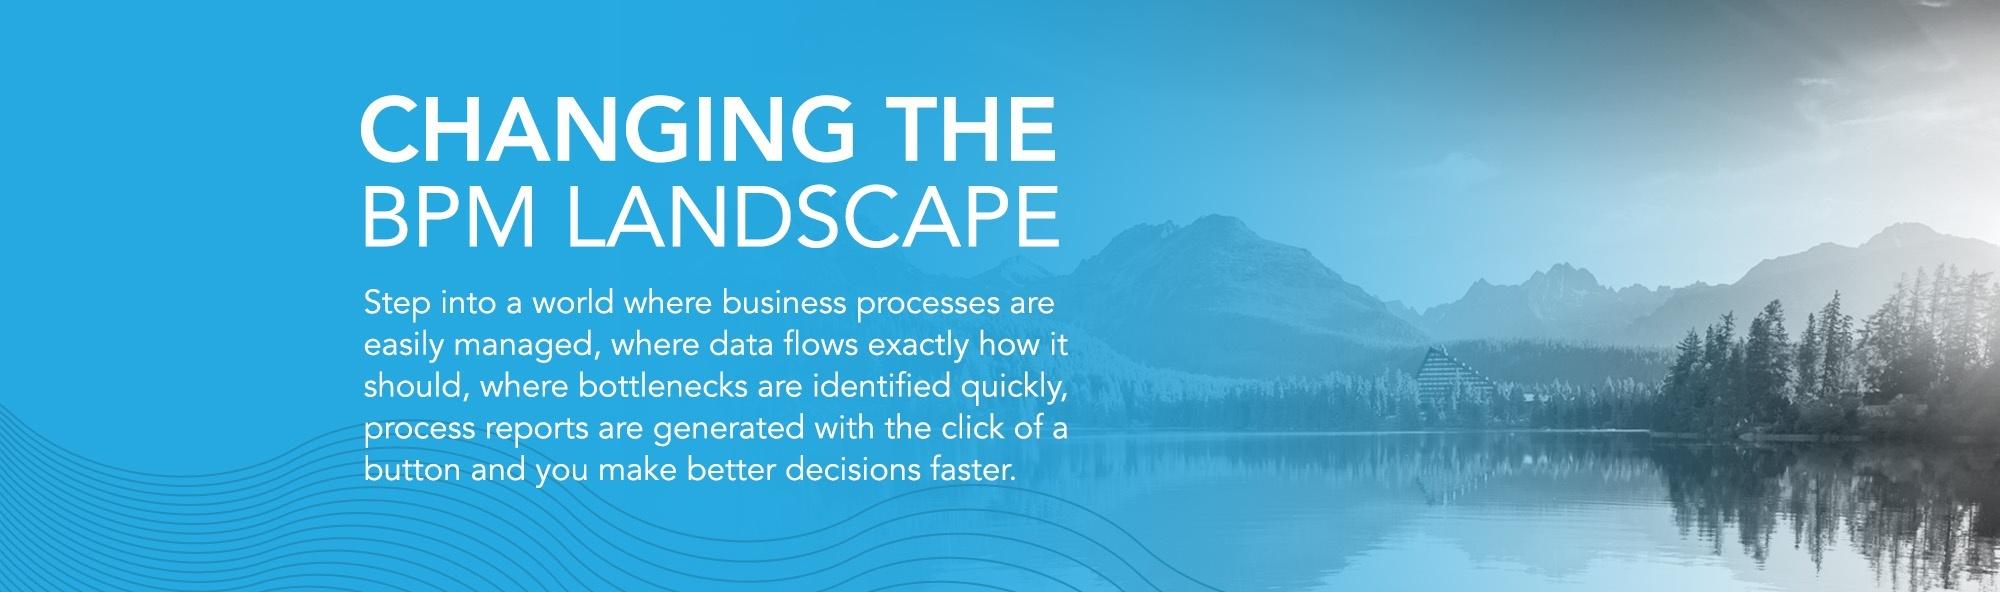 FlowForma changing the BPM landscape